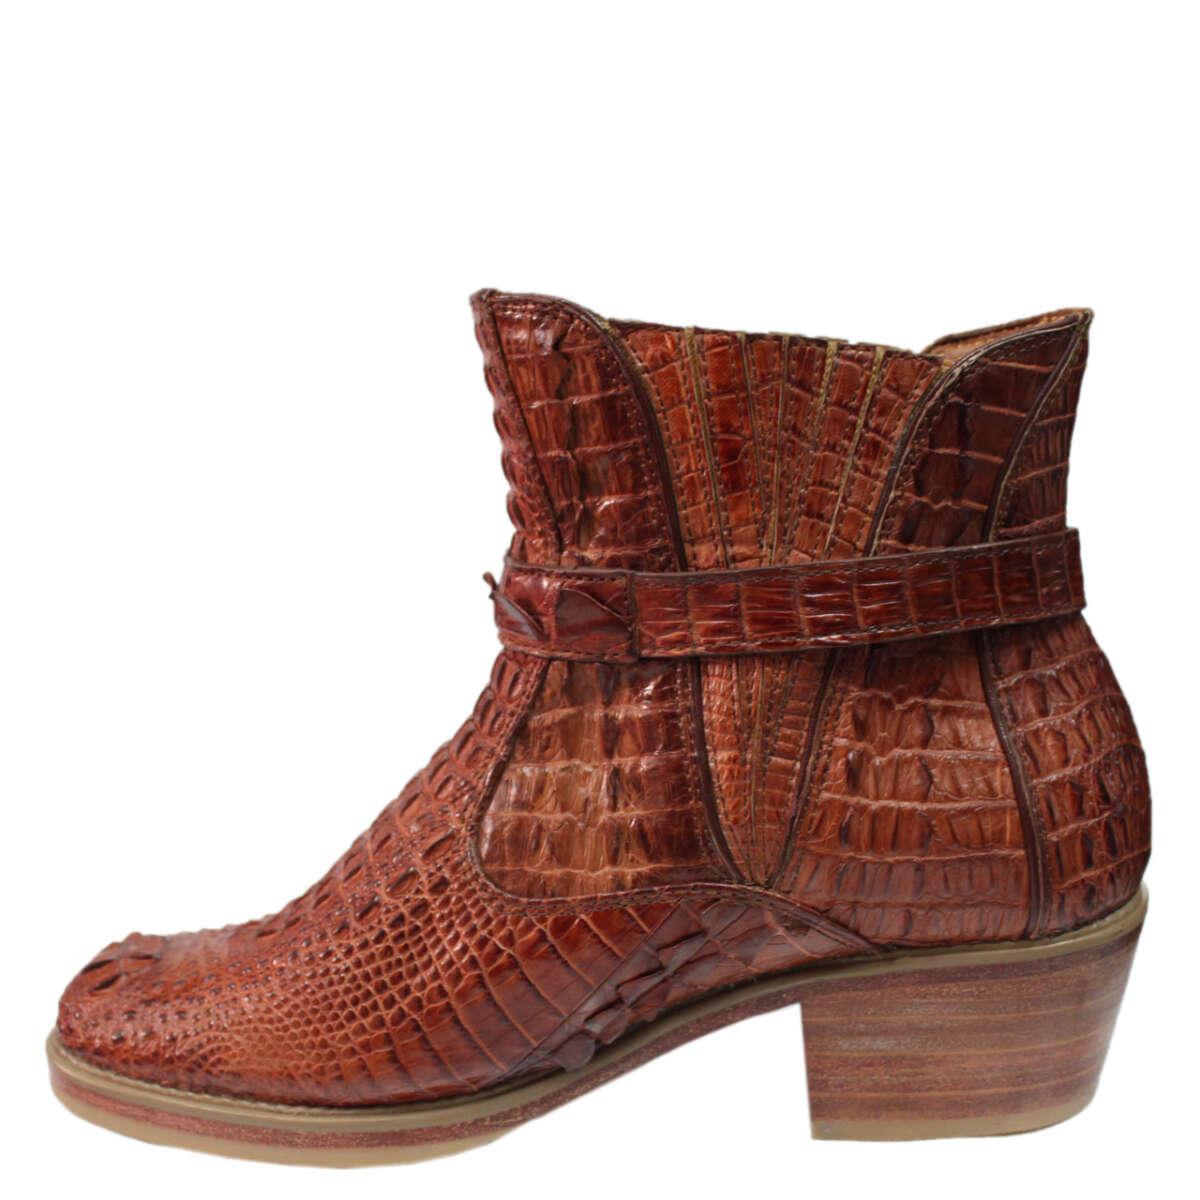 Giày nam da cá sấu S863